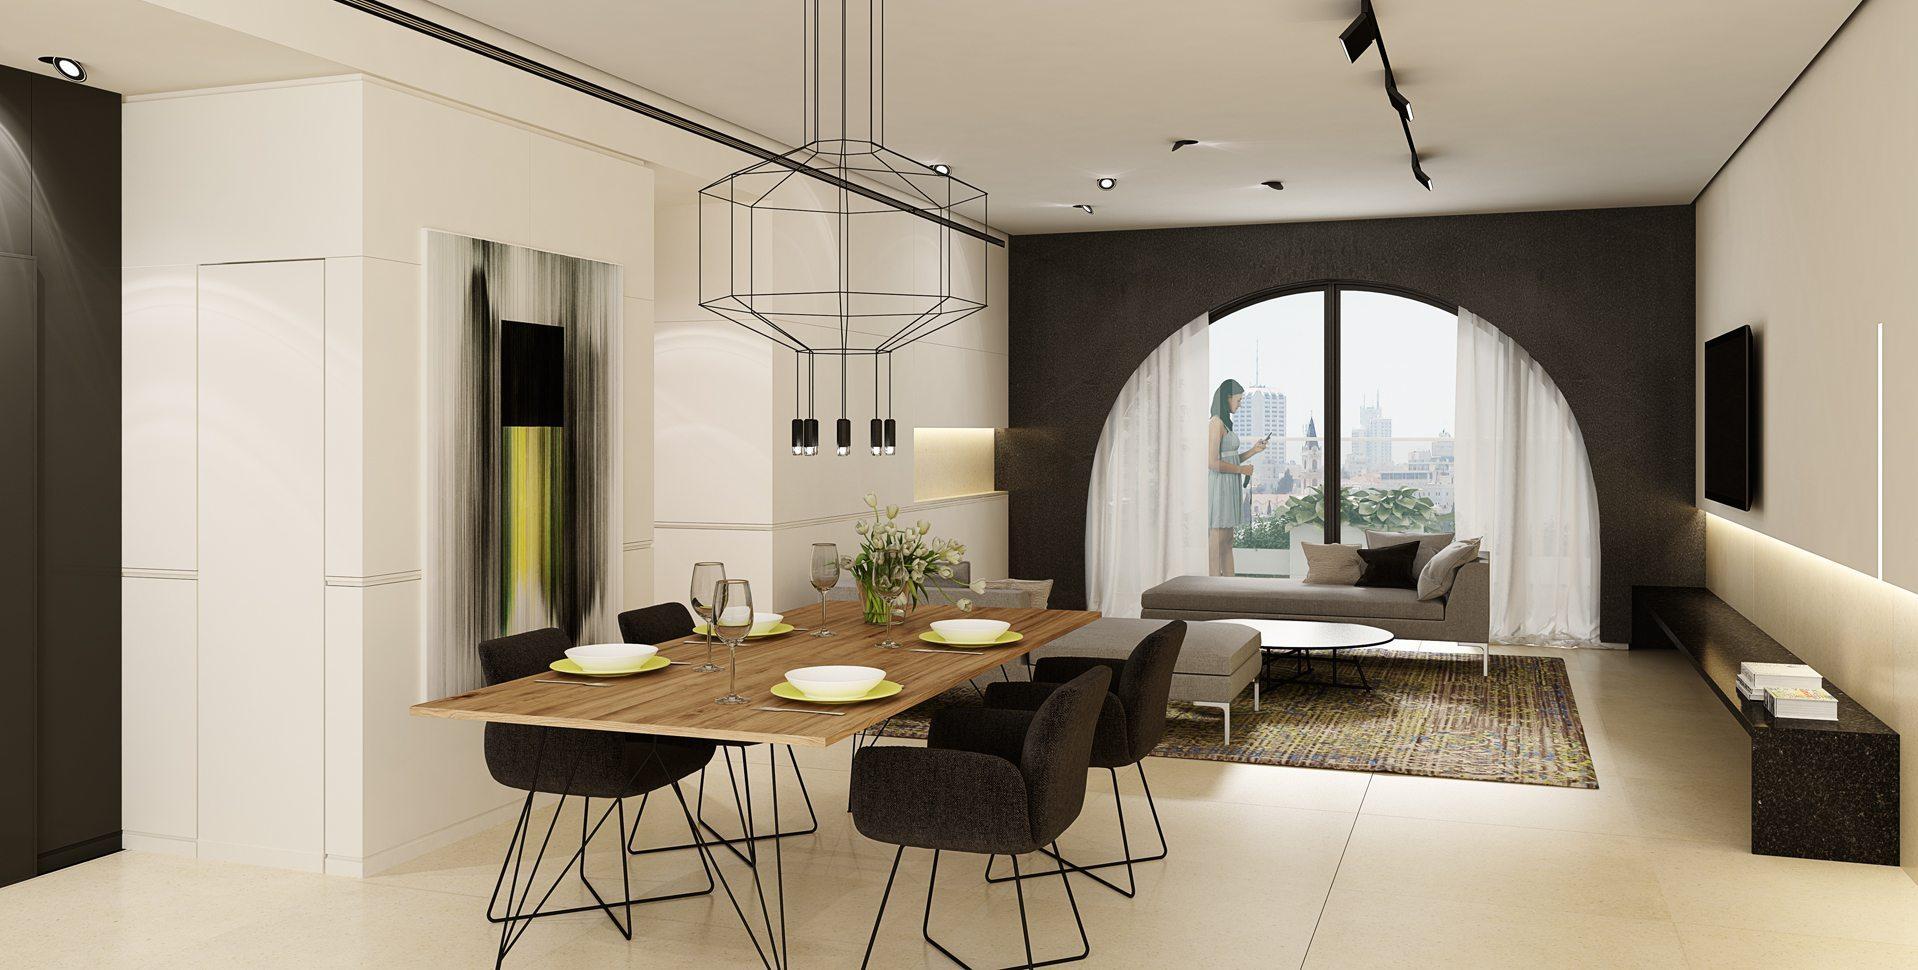 Architectural Visualization: Apartment interior design, Mamilla Project, Jerusalem